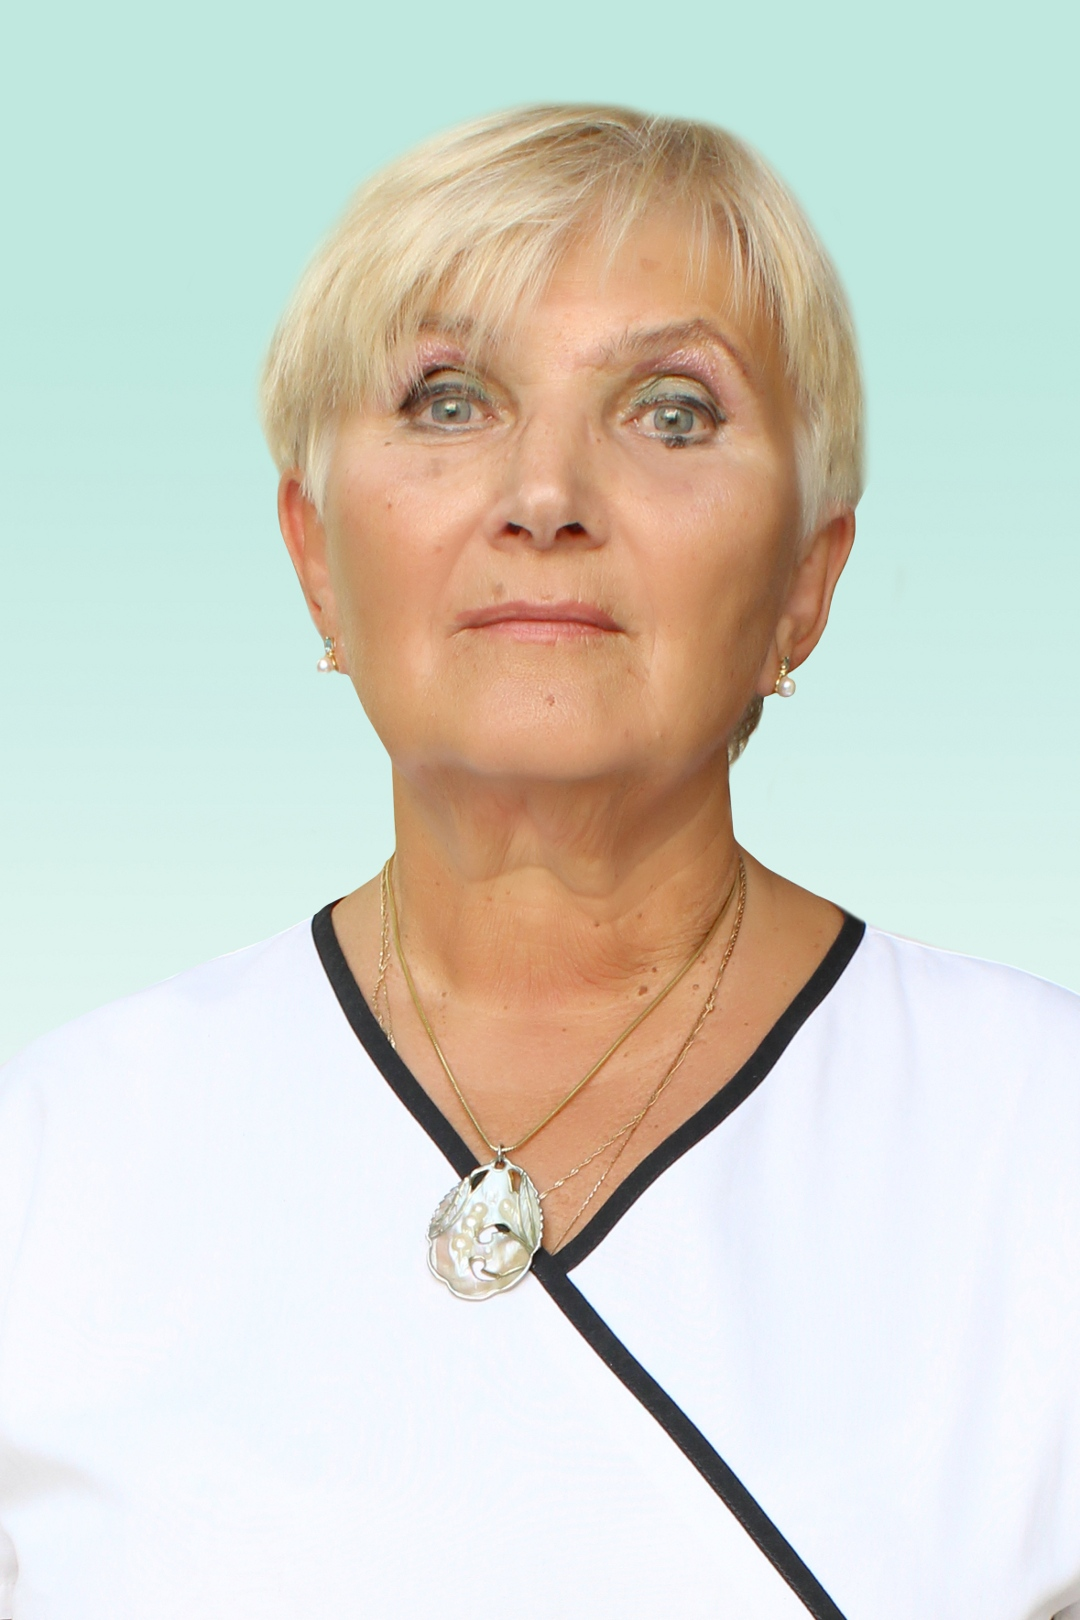 Врач акушер-гинеколог Клюшева Антонина Александровна